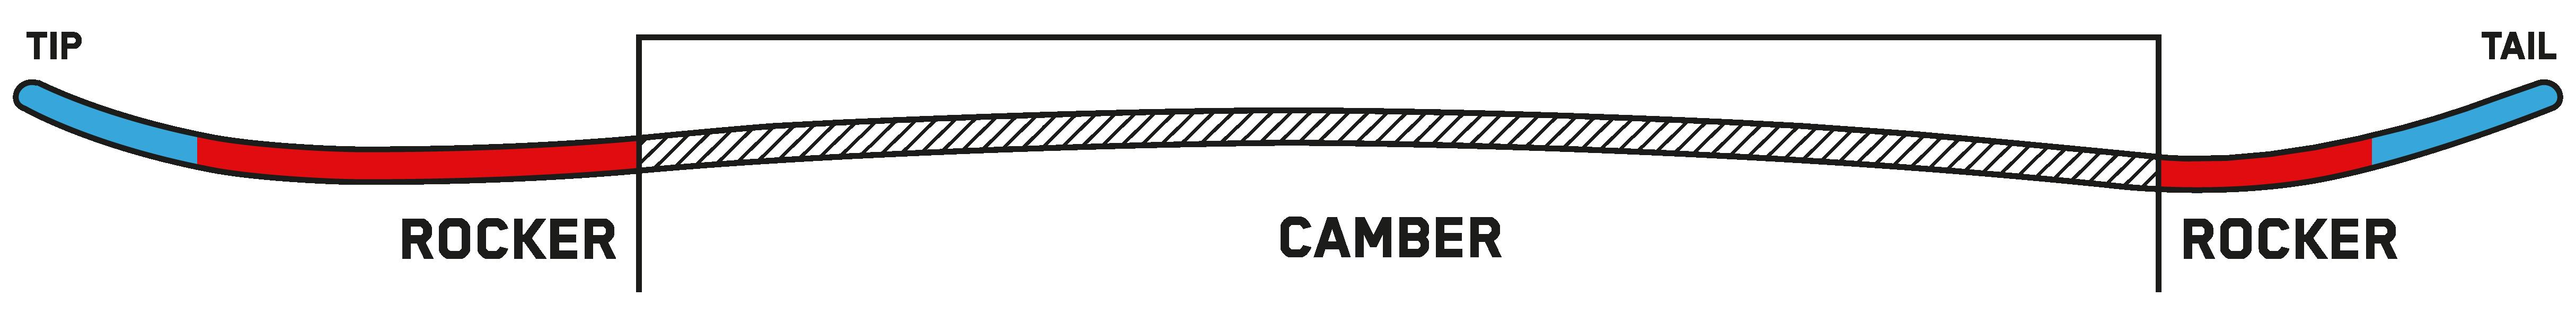 k2_2122_directional-combo-camber.mkv